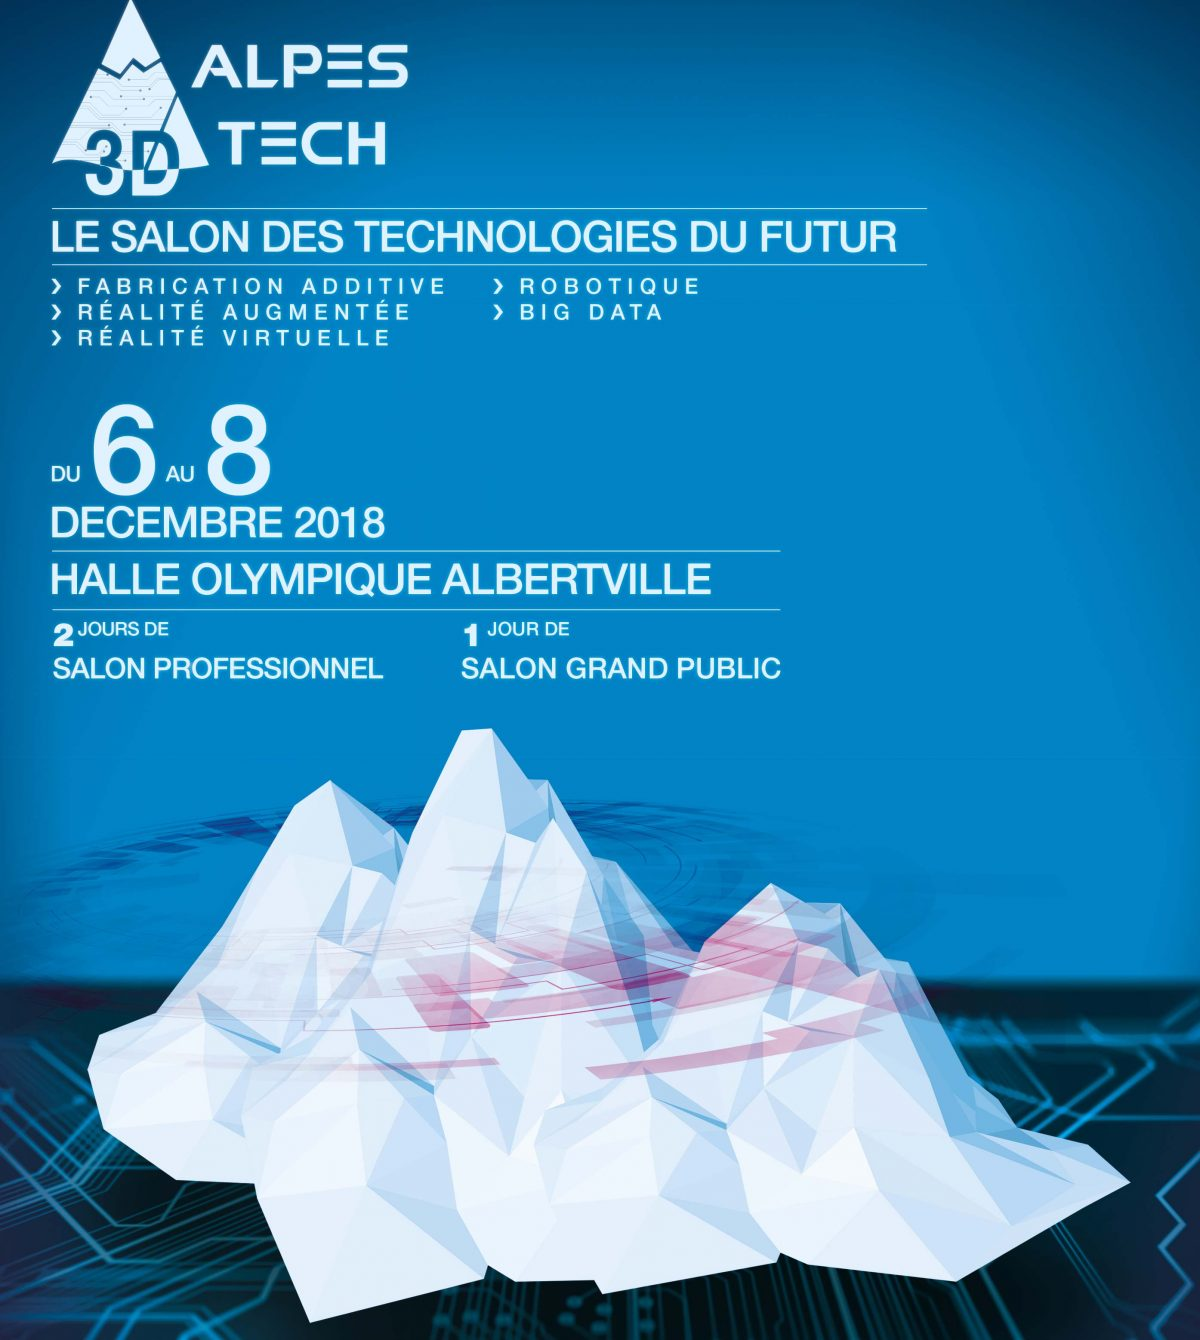 #3D : Salon Alpes 3D Tech à Albertville